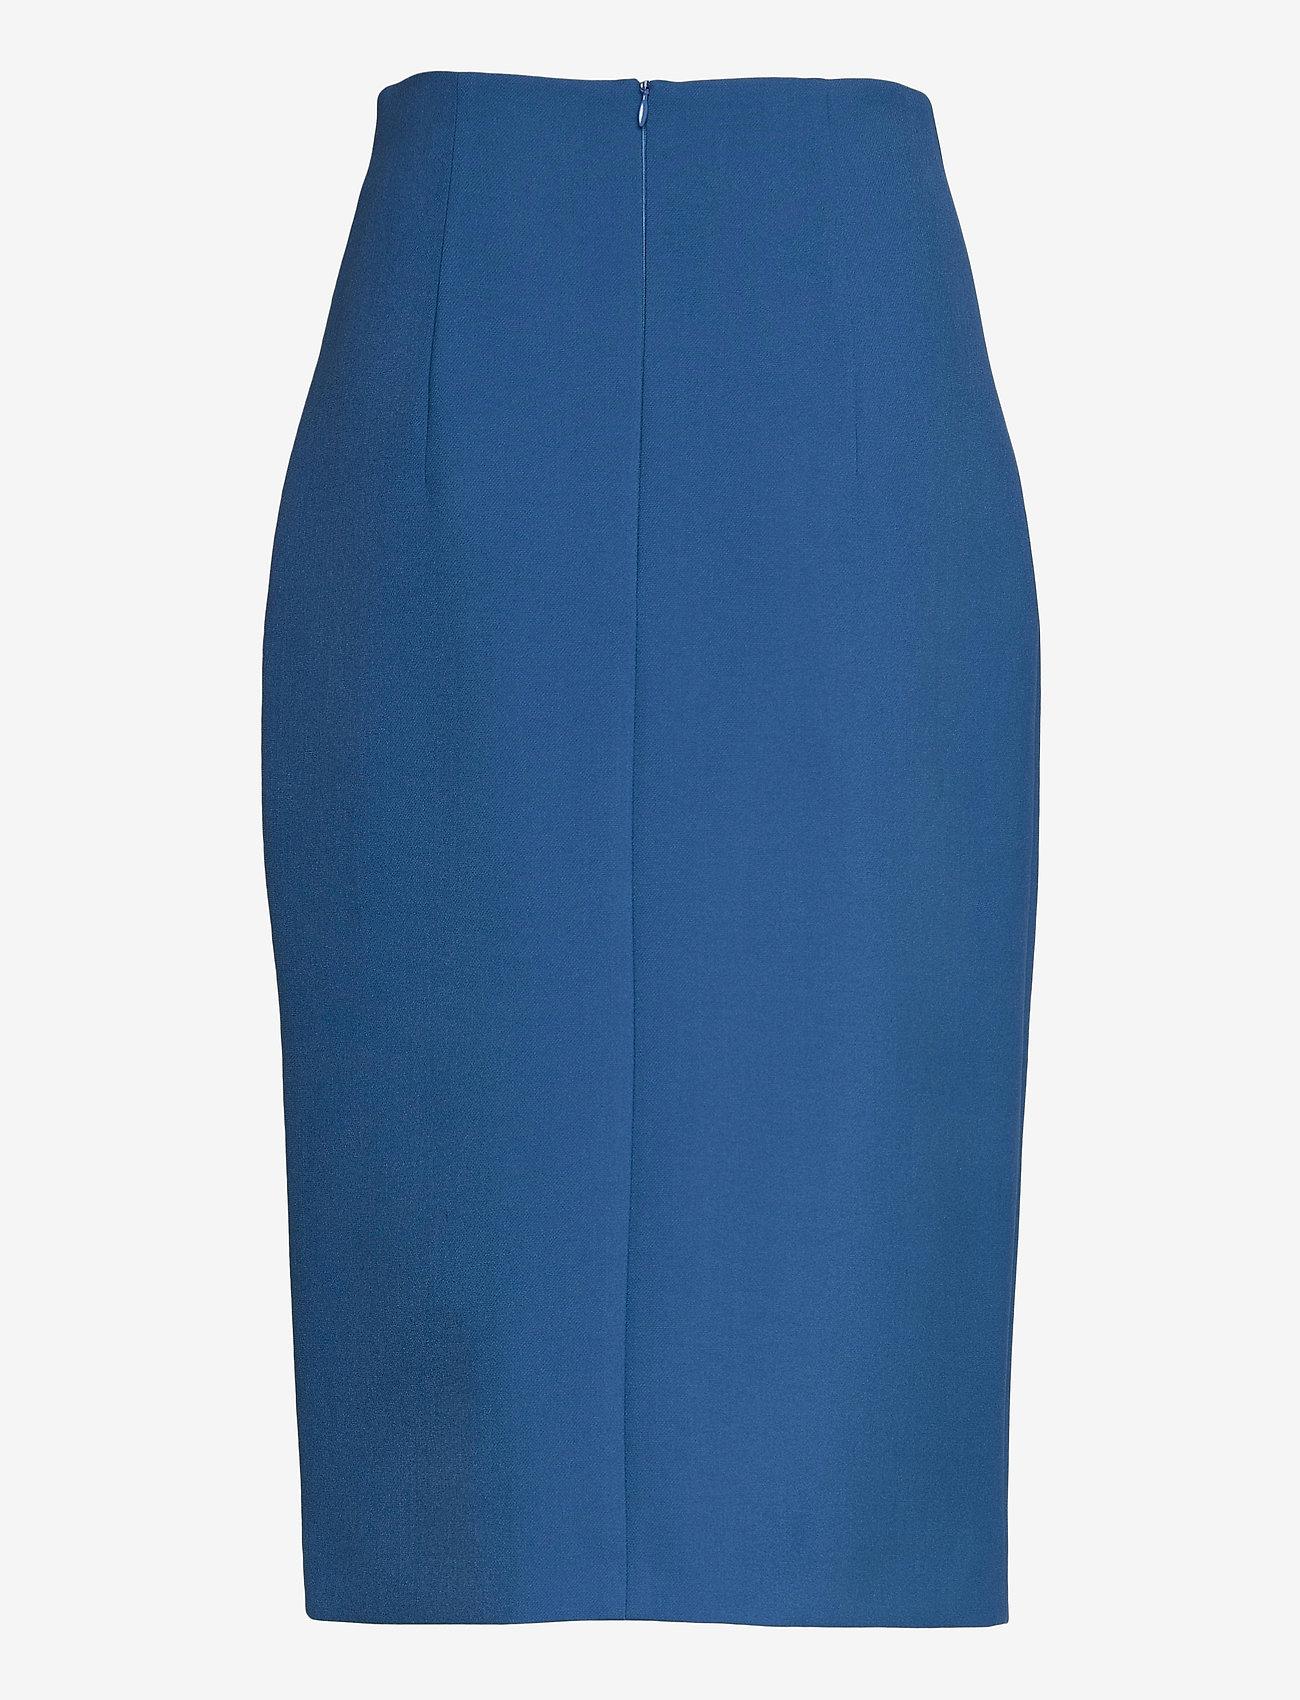 BOSS - Vianno1 - jupes midi - open blue - 1